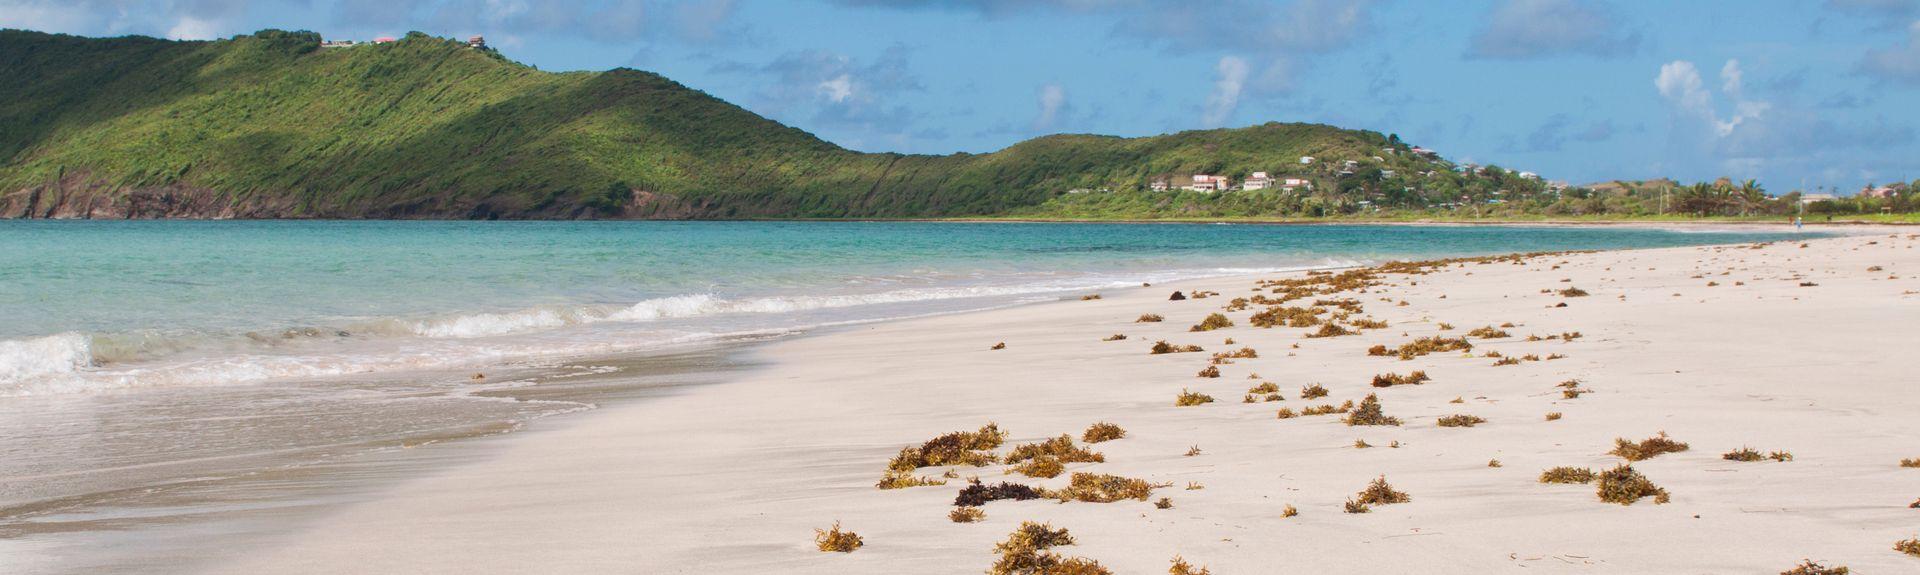 Sandy Beach, Vieux Fort, St.Lucia